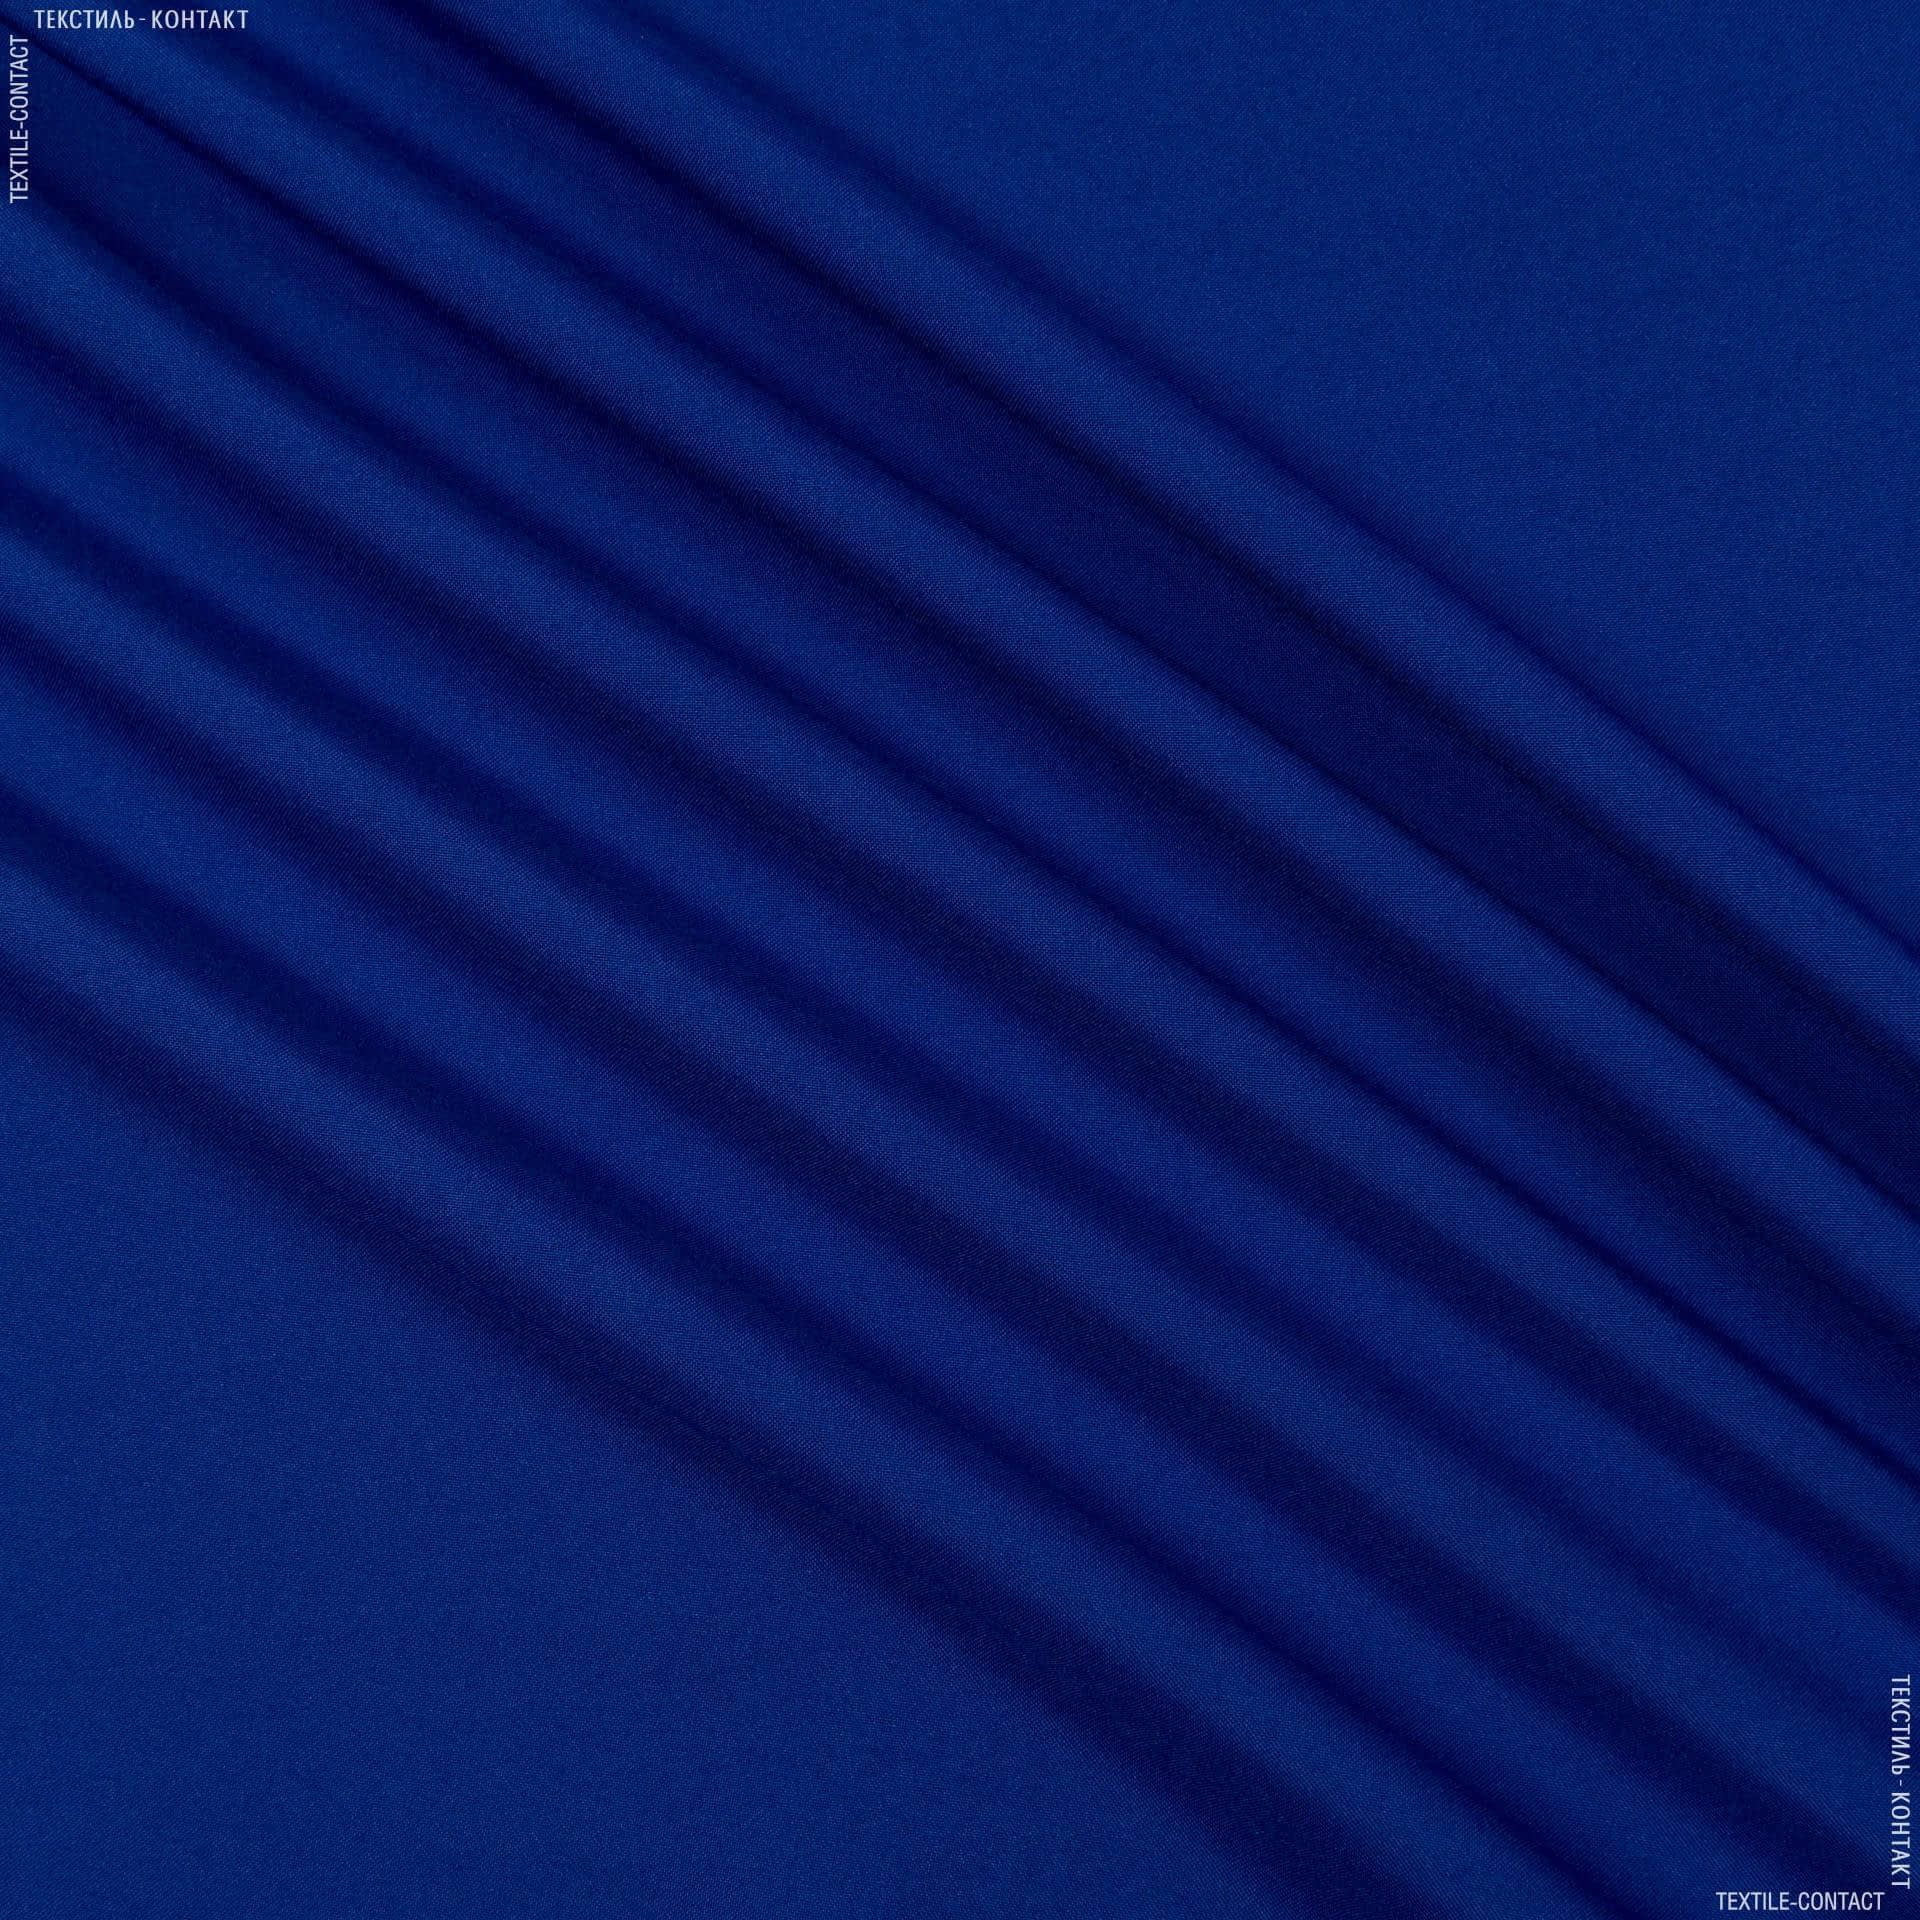 Ткани для спецодежды - Габардин электрик